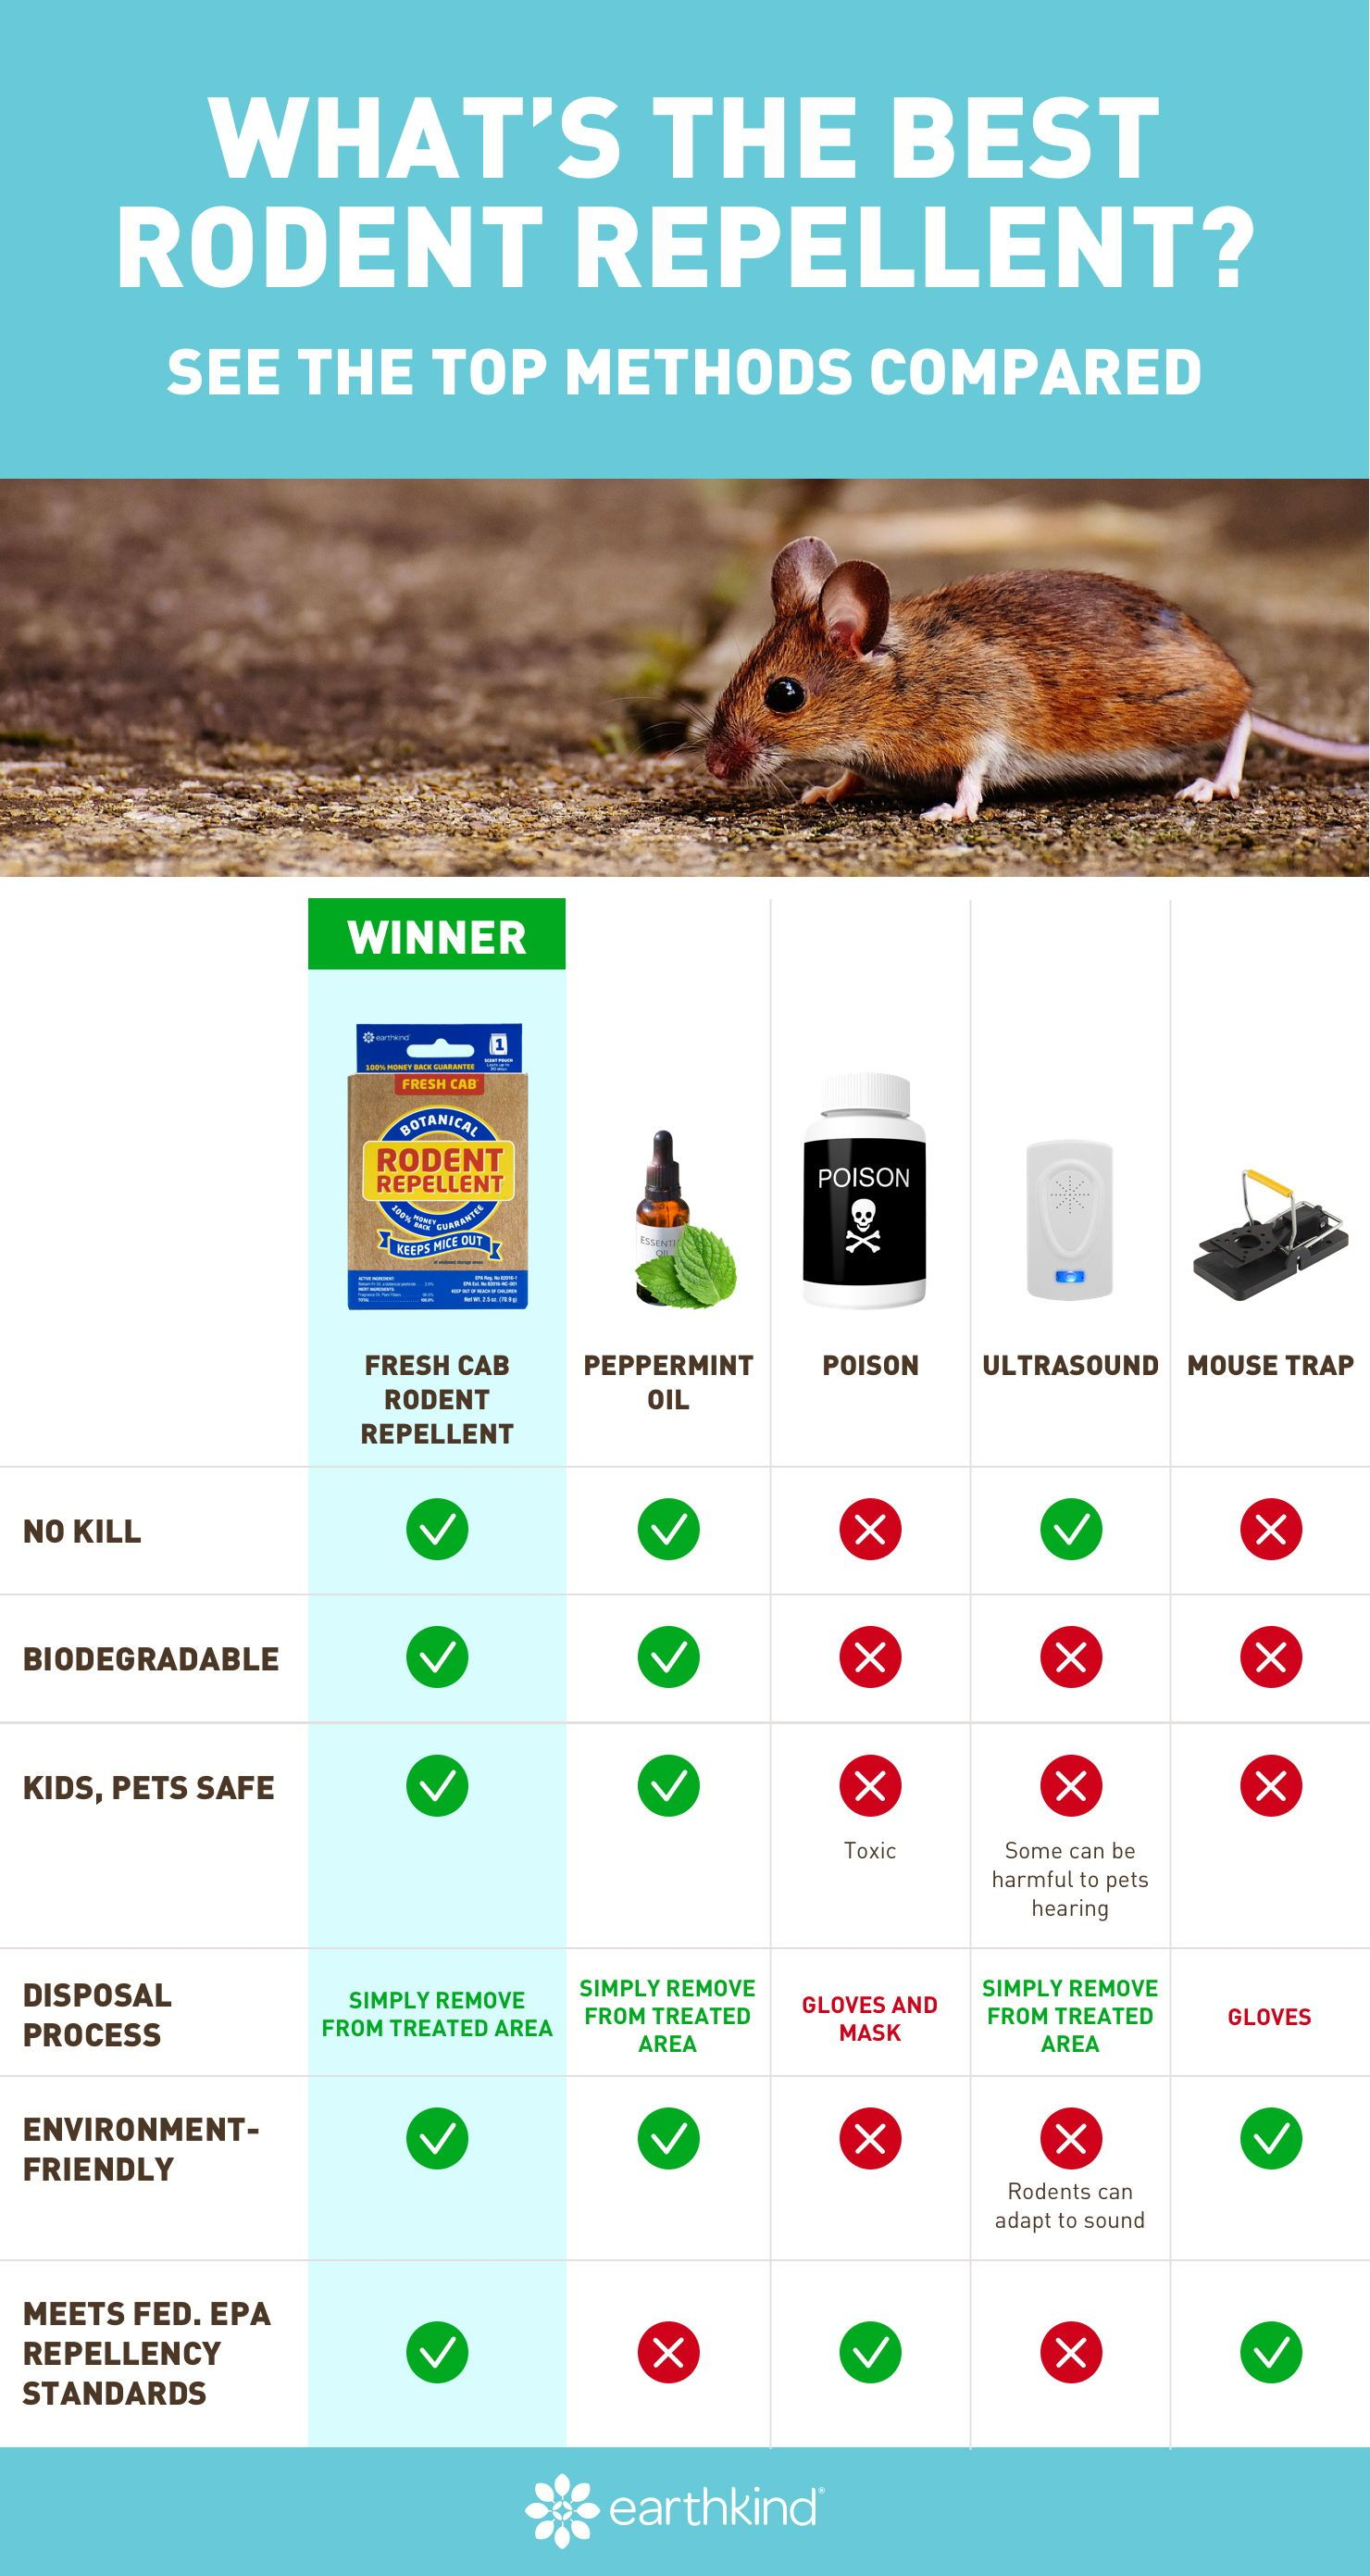 Fresh Cab Rodent Repellent In 2020 Rodent Repellent Repellent Pest Control